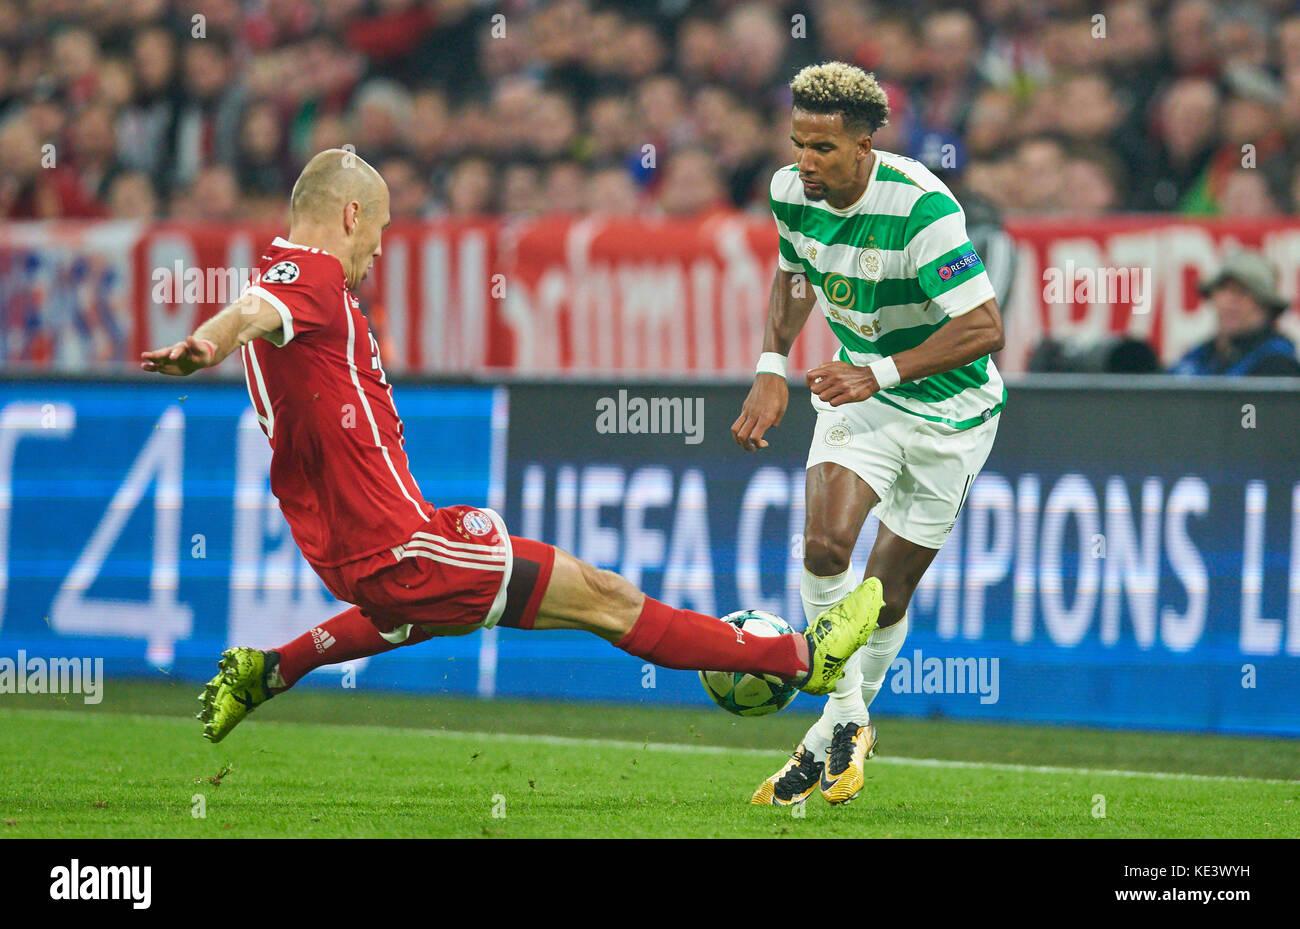 Munich, Germany. 18th Oct, 2017. FC Bayern Munich Soccer, Munich, October 18, 2017 Arjen ROBBEN, FCB 10 compete - Stock Image